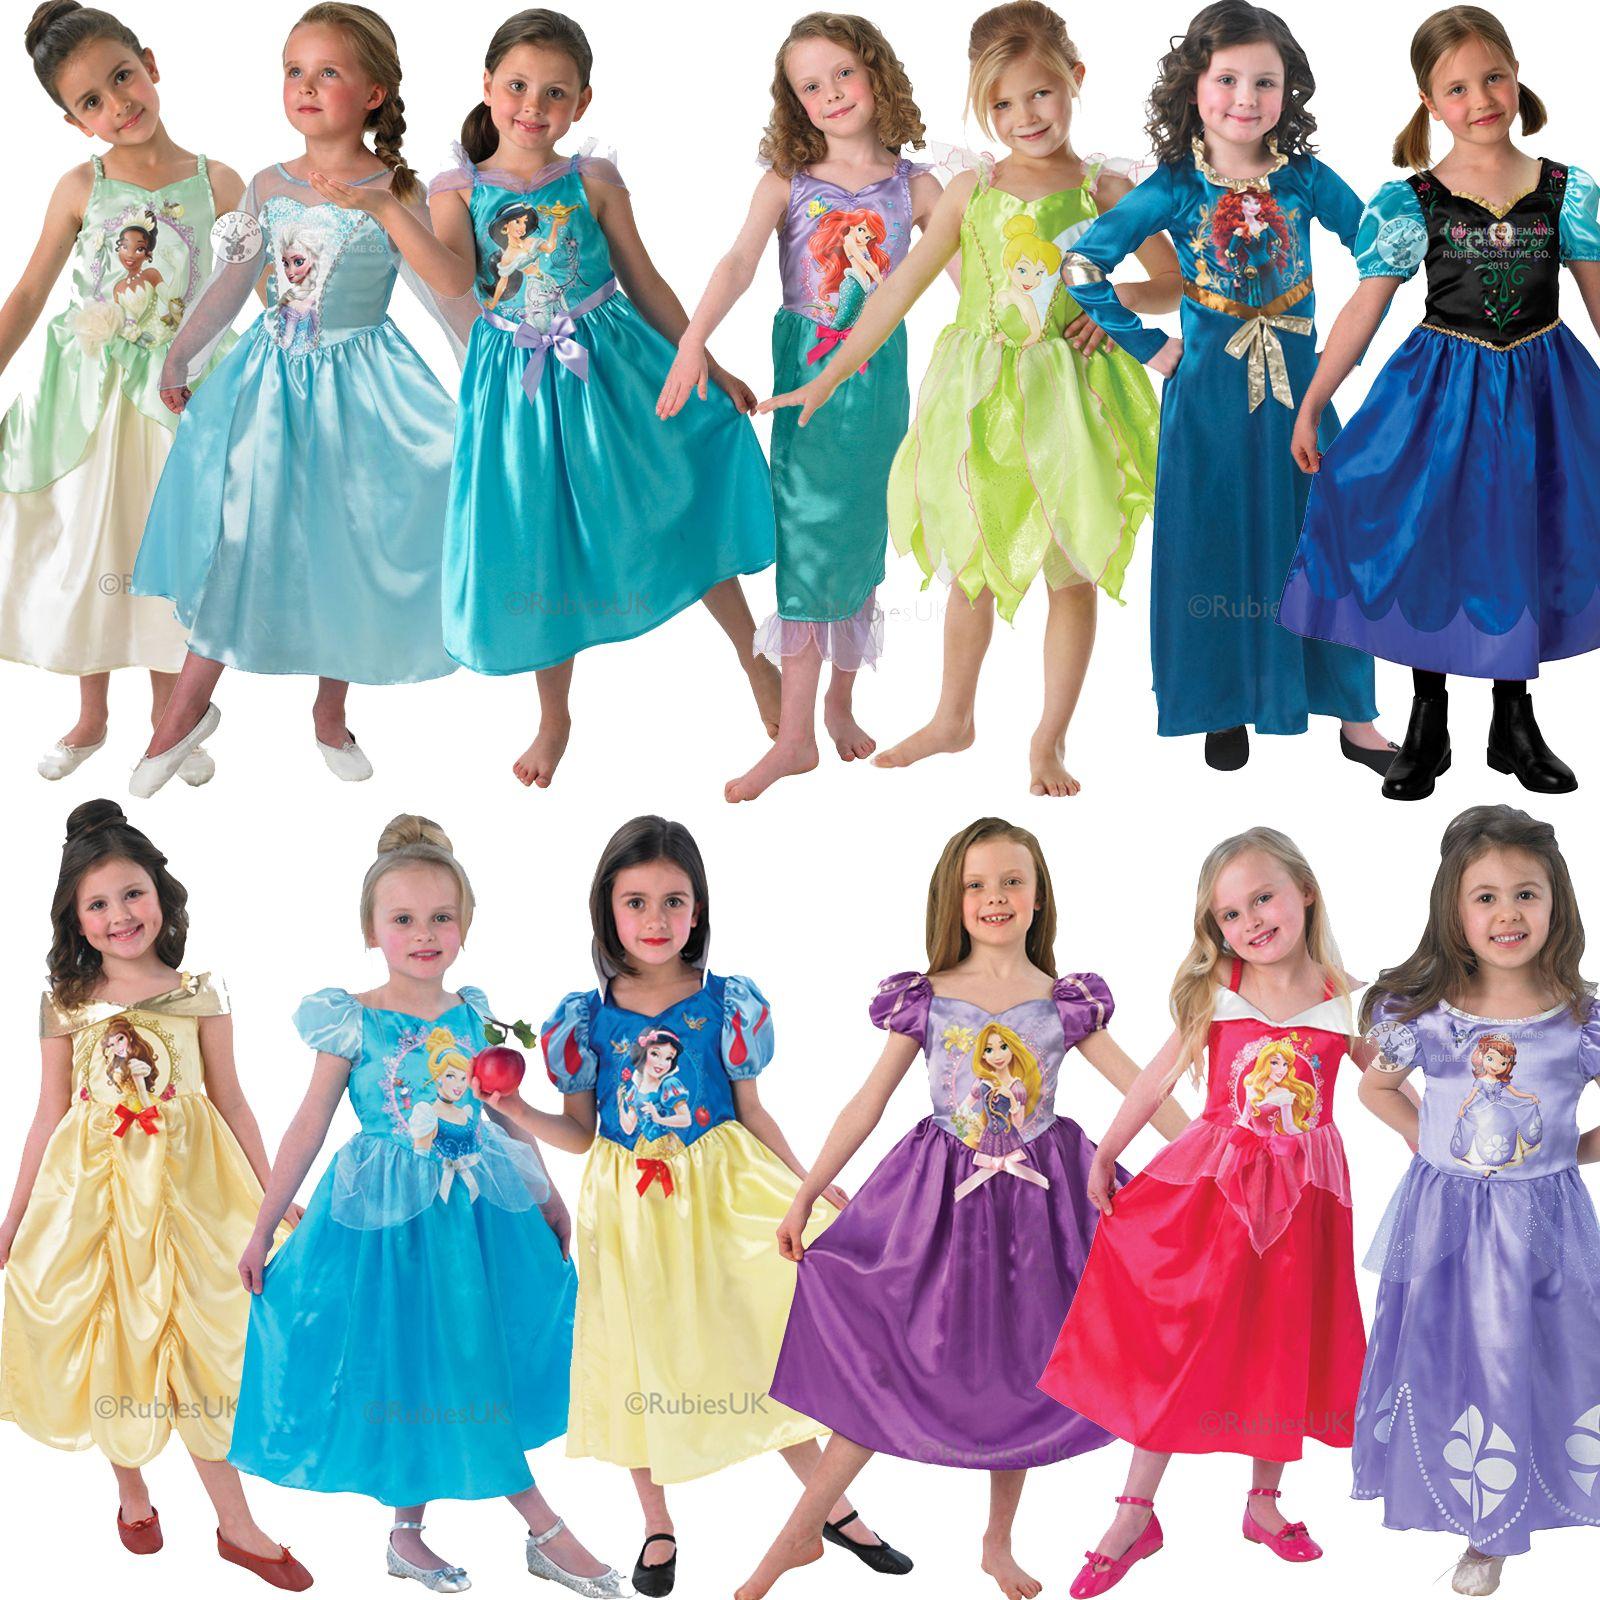 LICENSED ROYAL PRINCE CHARMING CHILD BOYS FANCY DRESS BOOK WEEK COSTUME